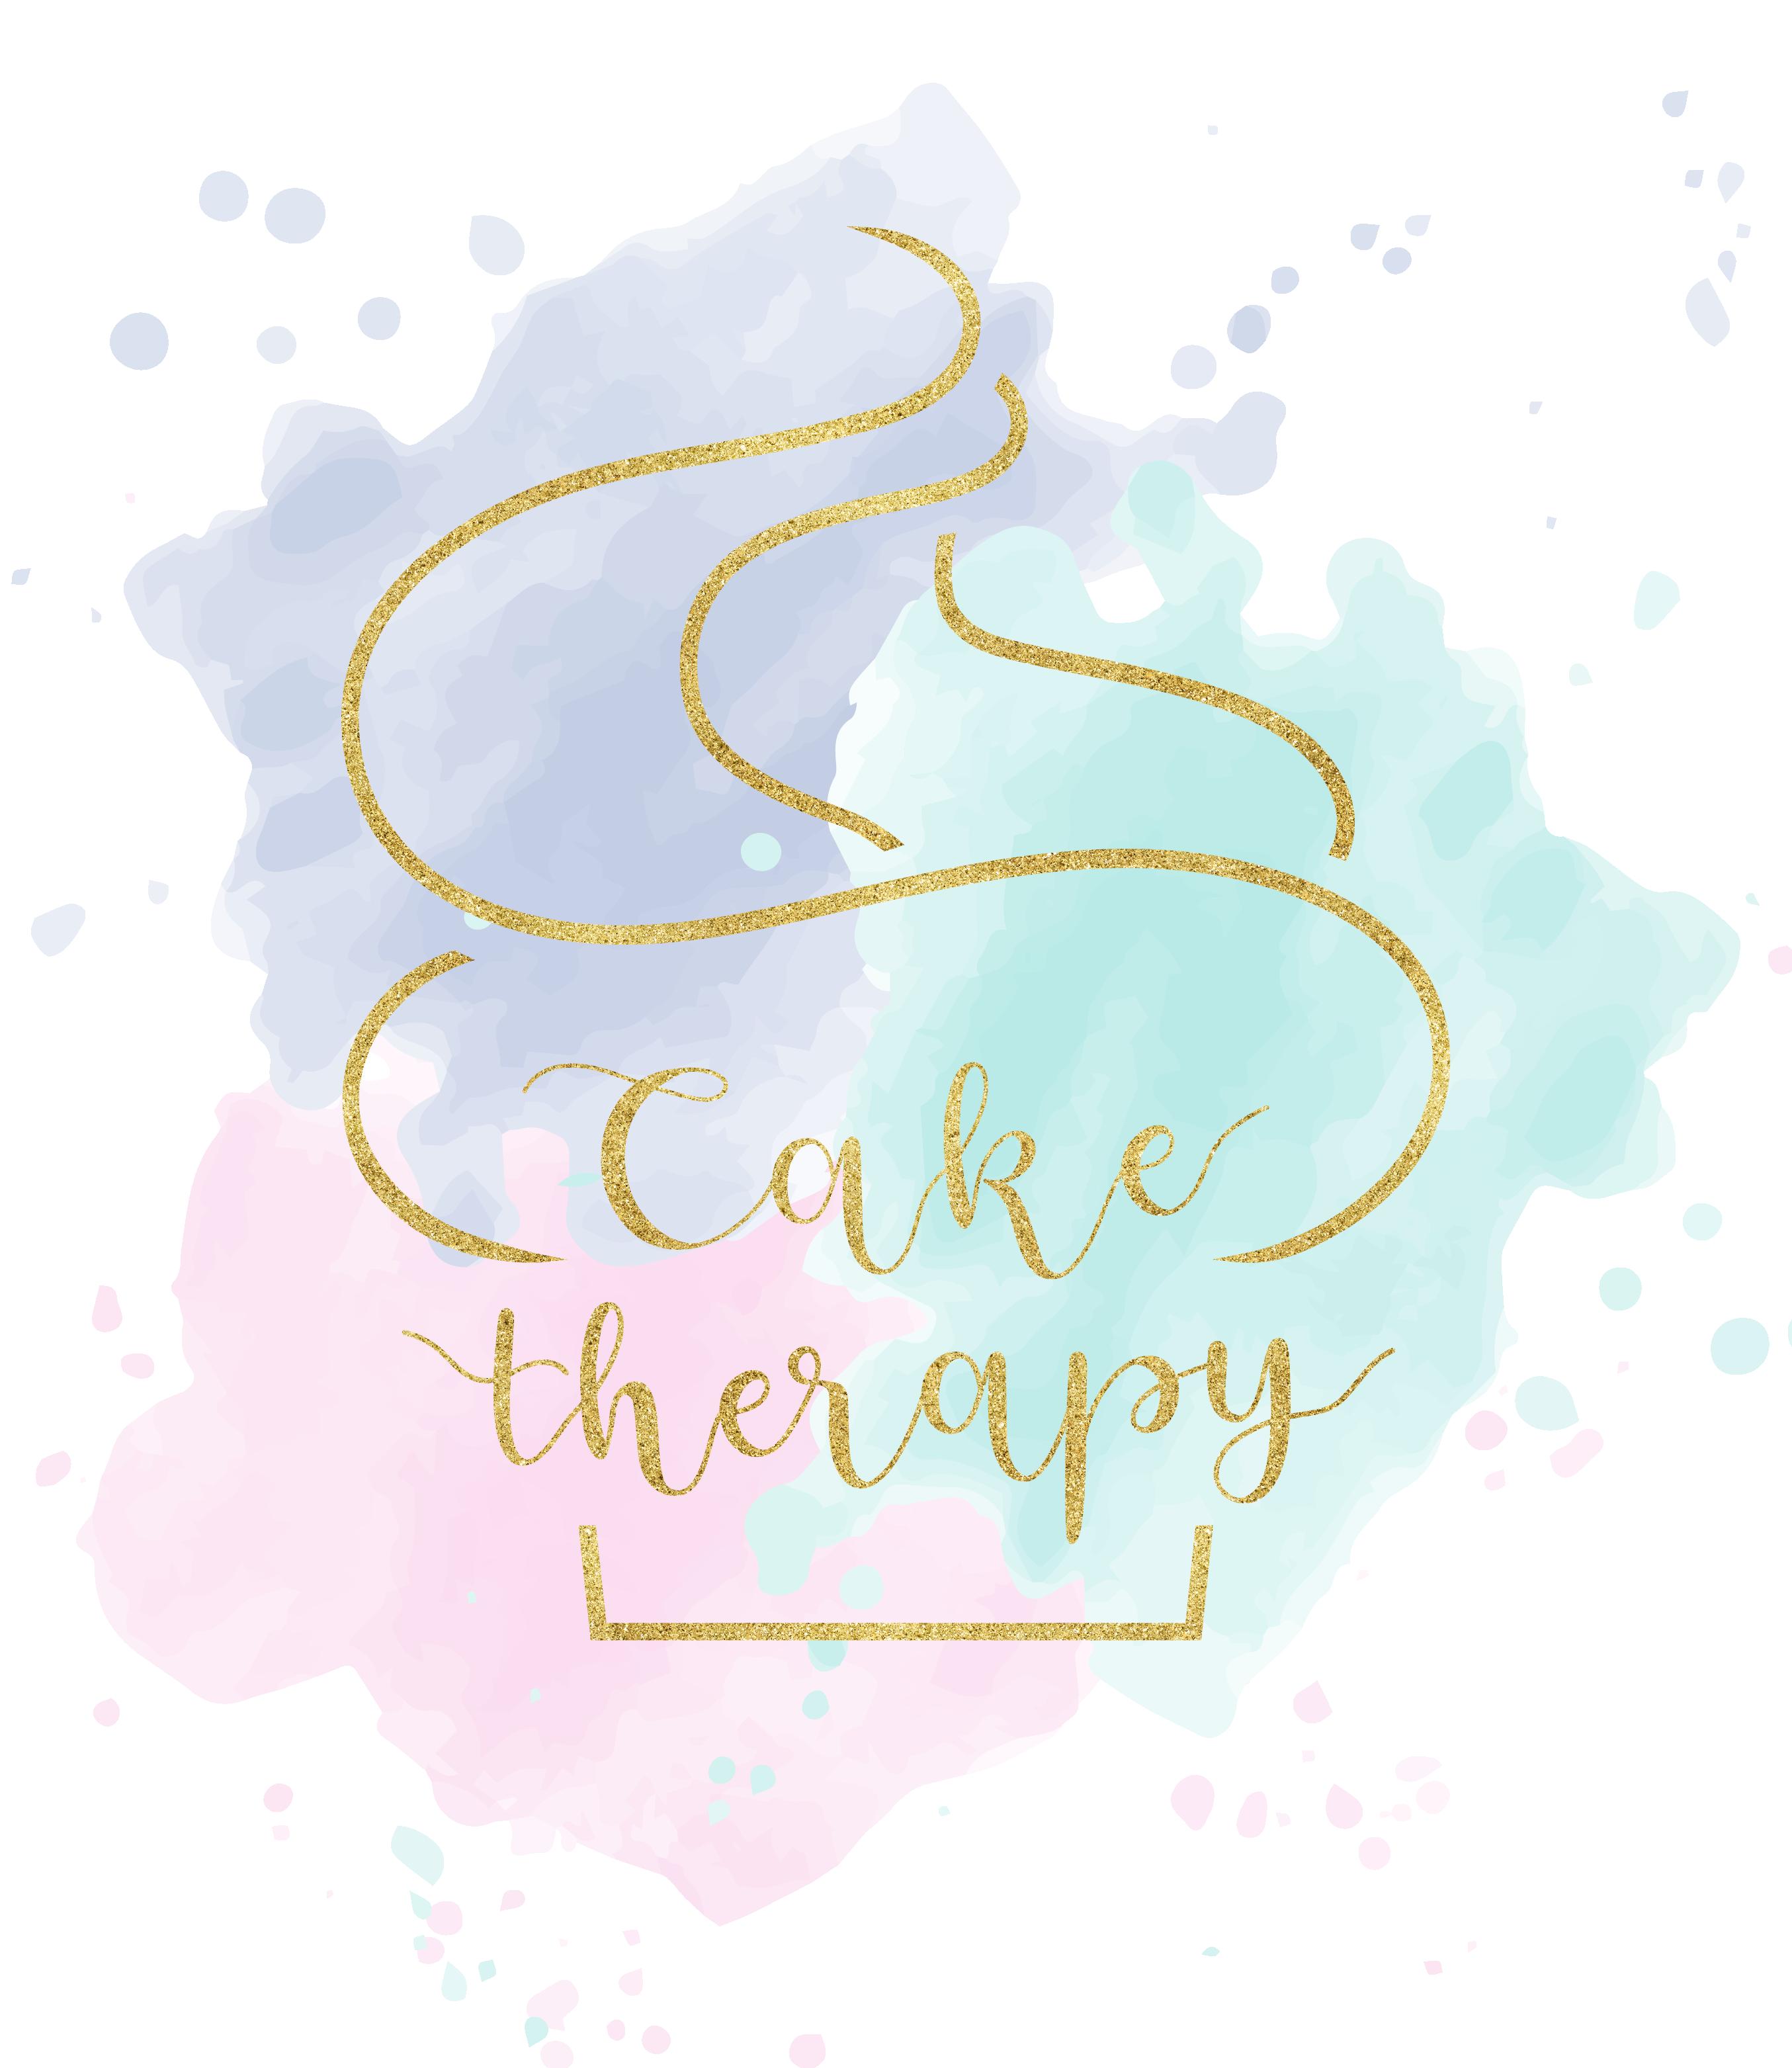 logo caketherapy